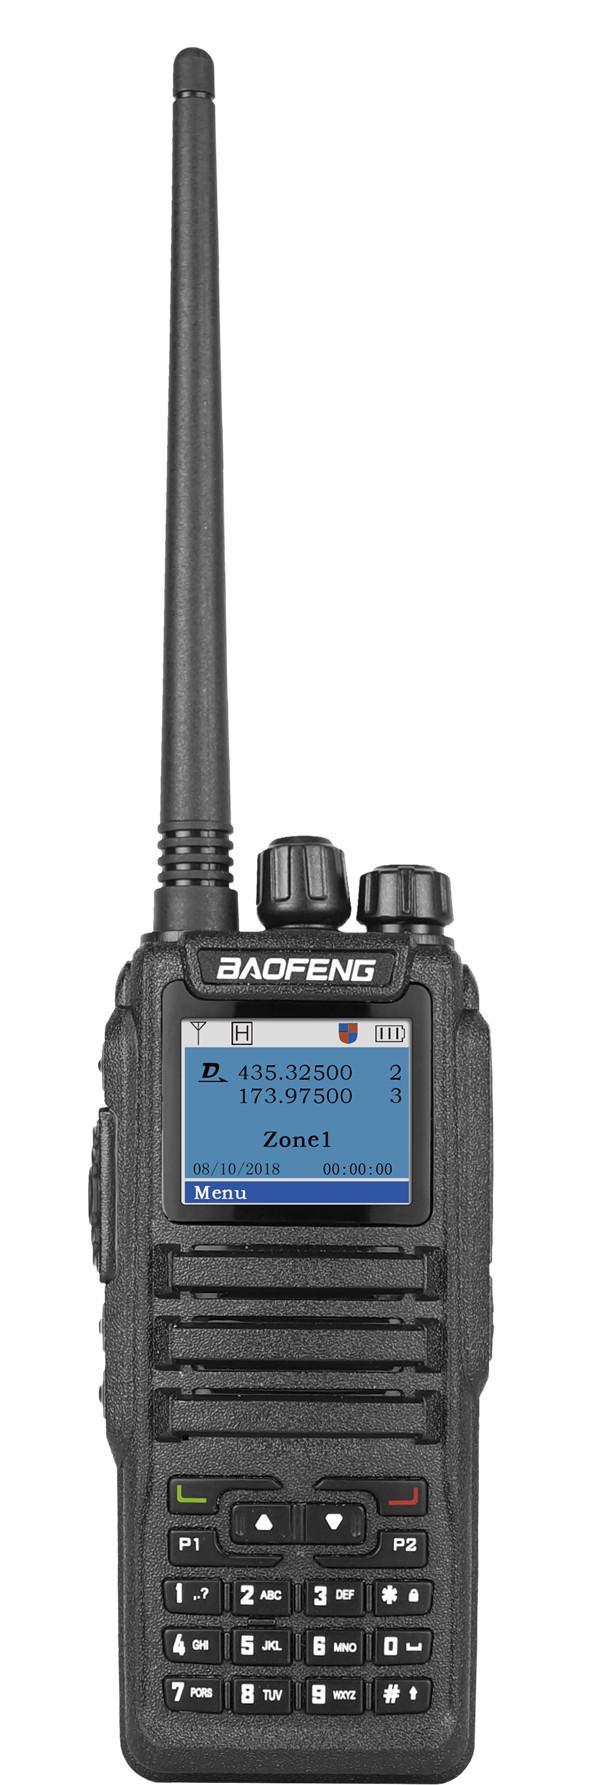 BAOFENG DM-1701 TIER II DMR Ham Amateur Encrypted Radio